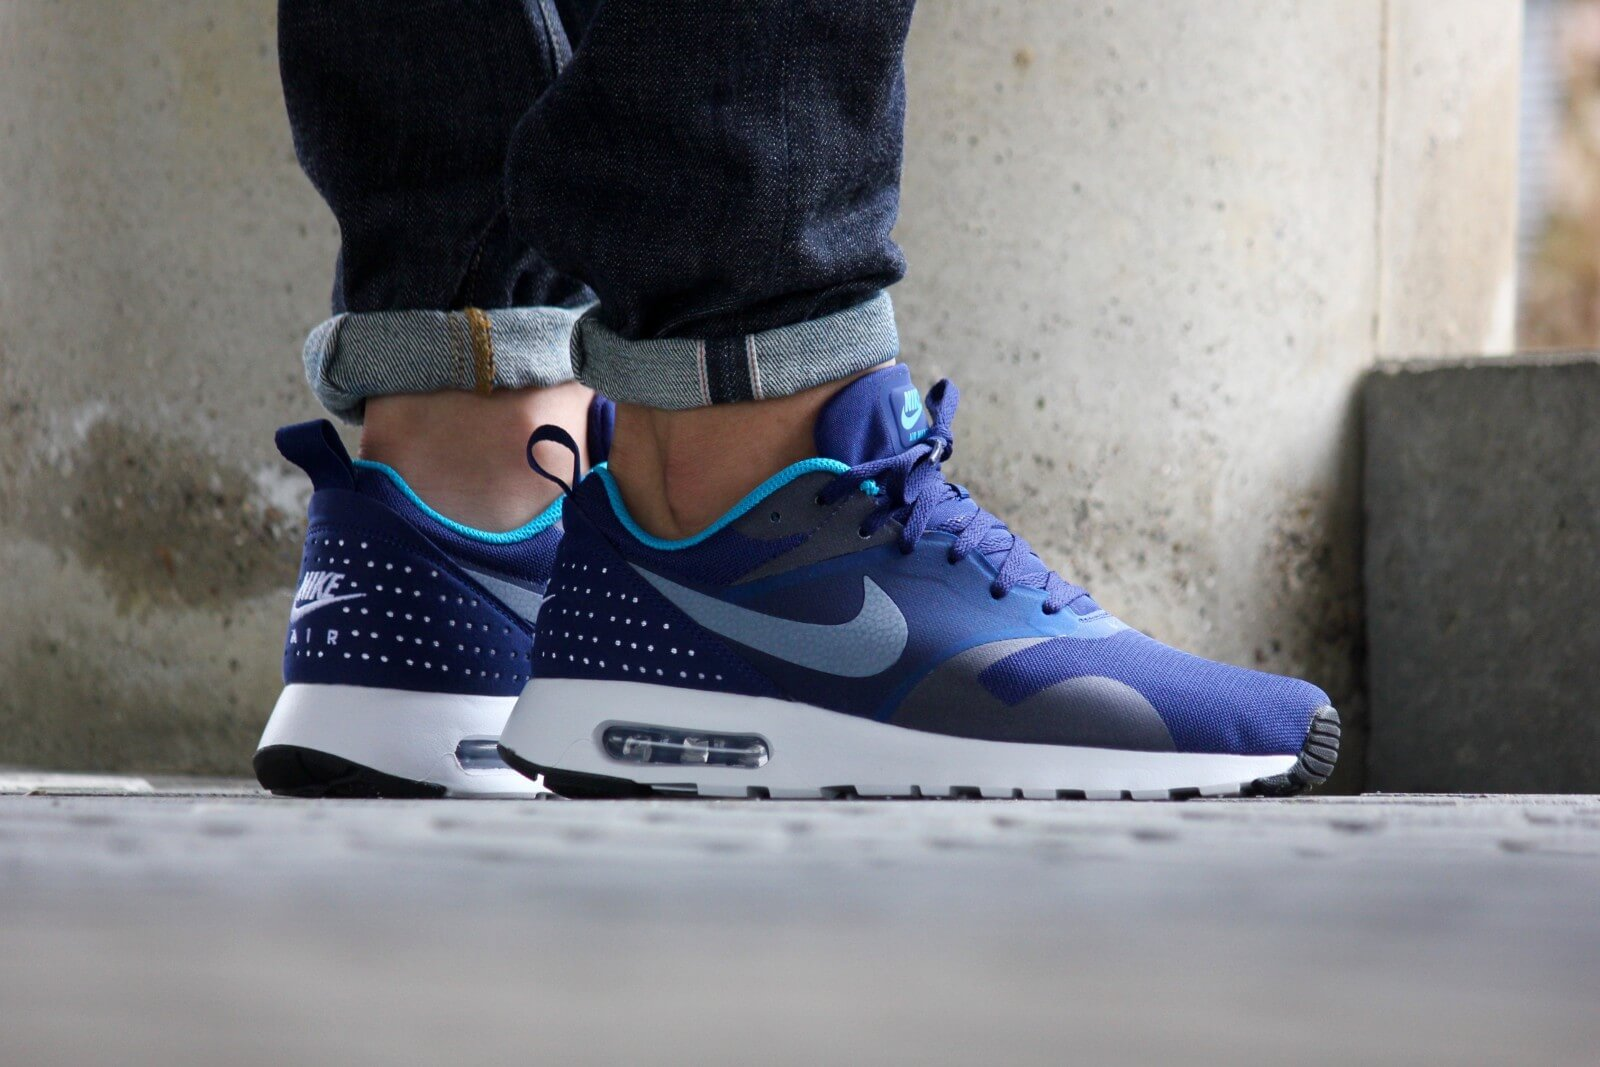 Nike Air Max Tavas Loyal Blue/ White